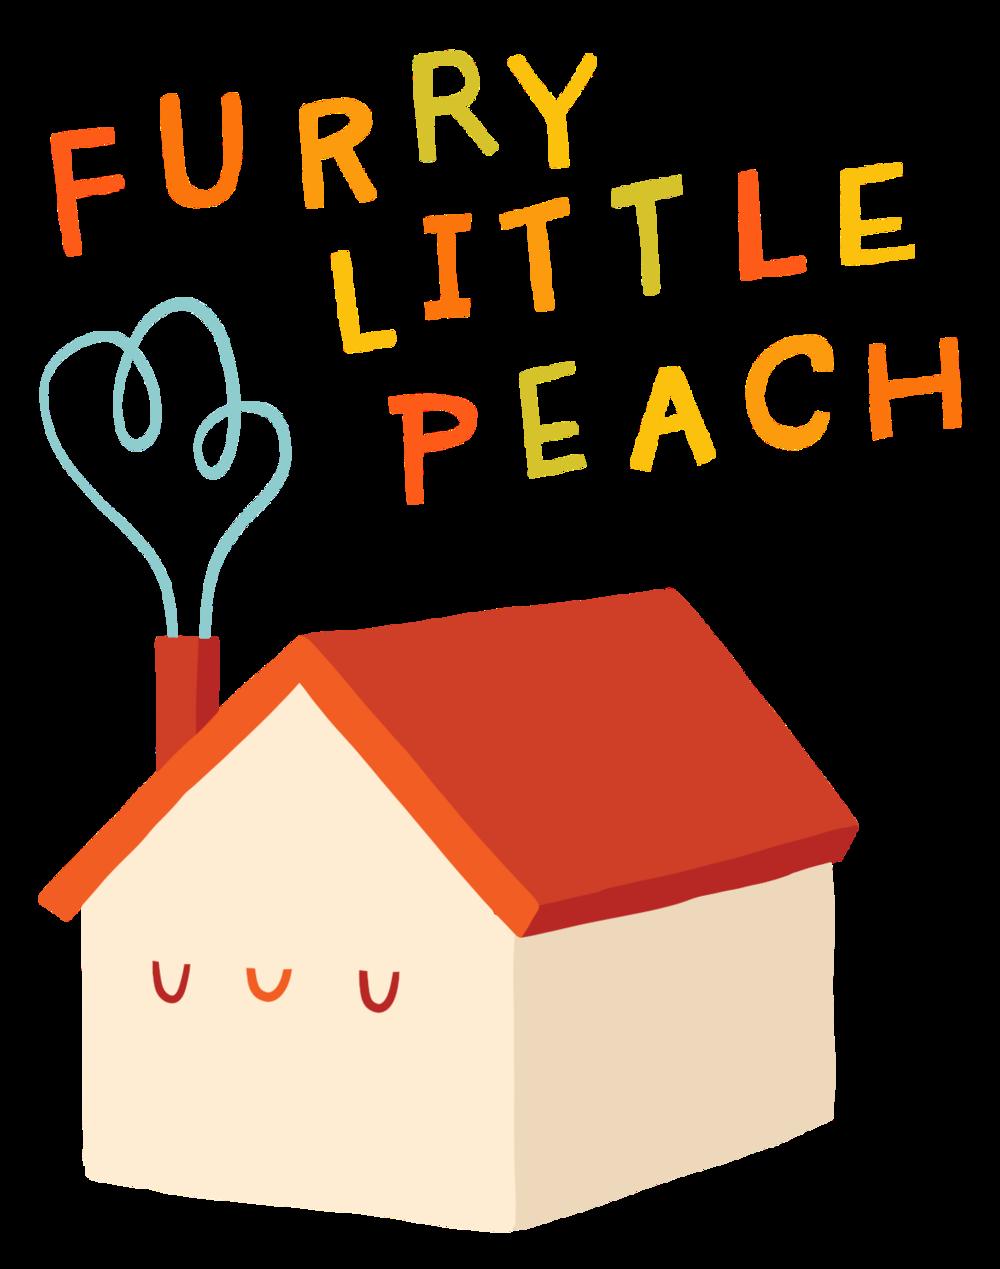 Furry Little Peach Store — FURRY LITTLE PEACH